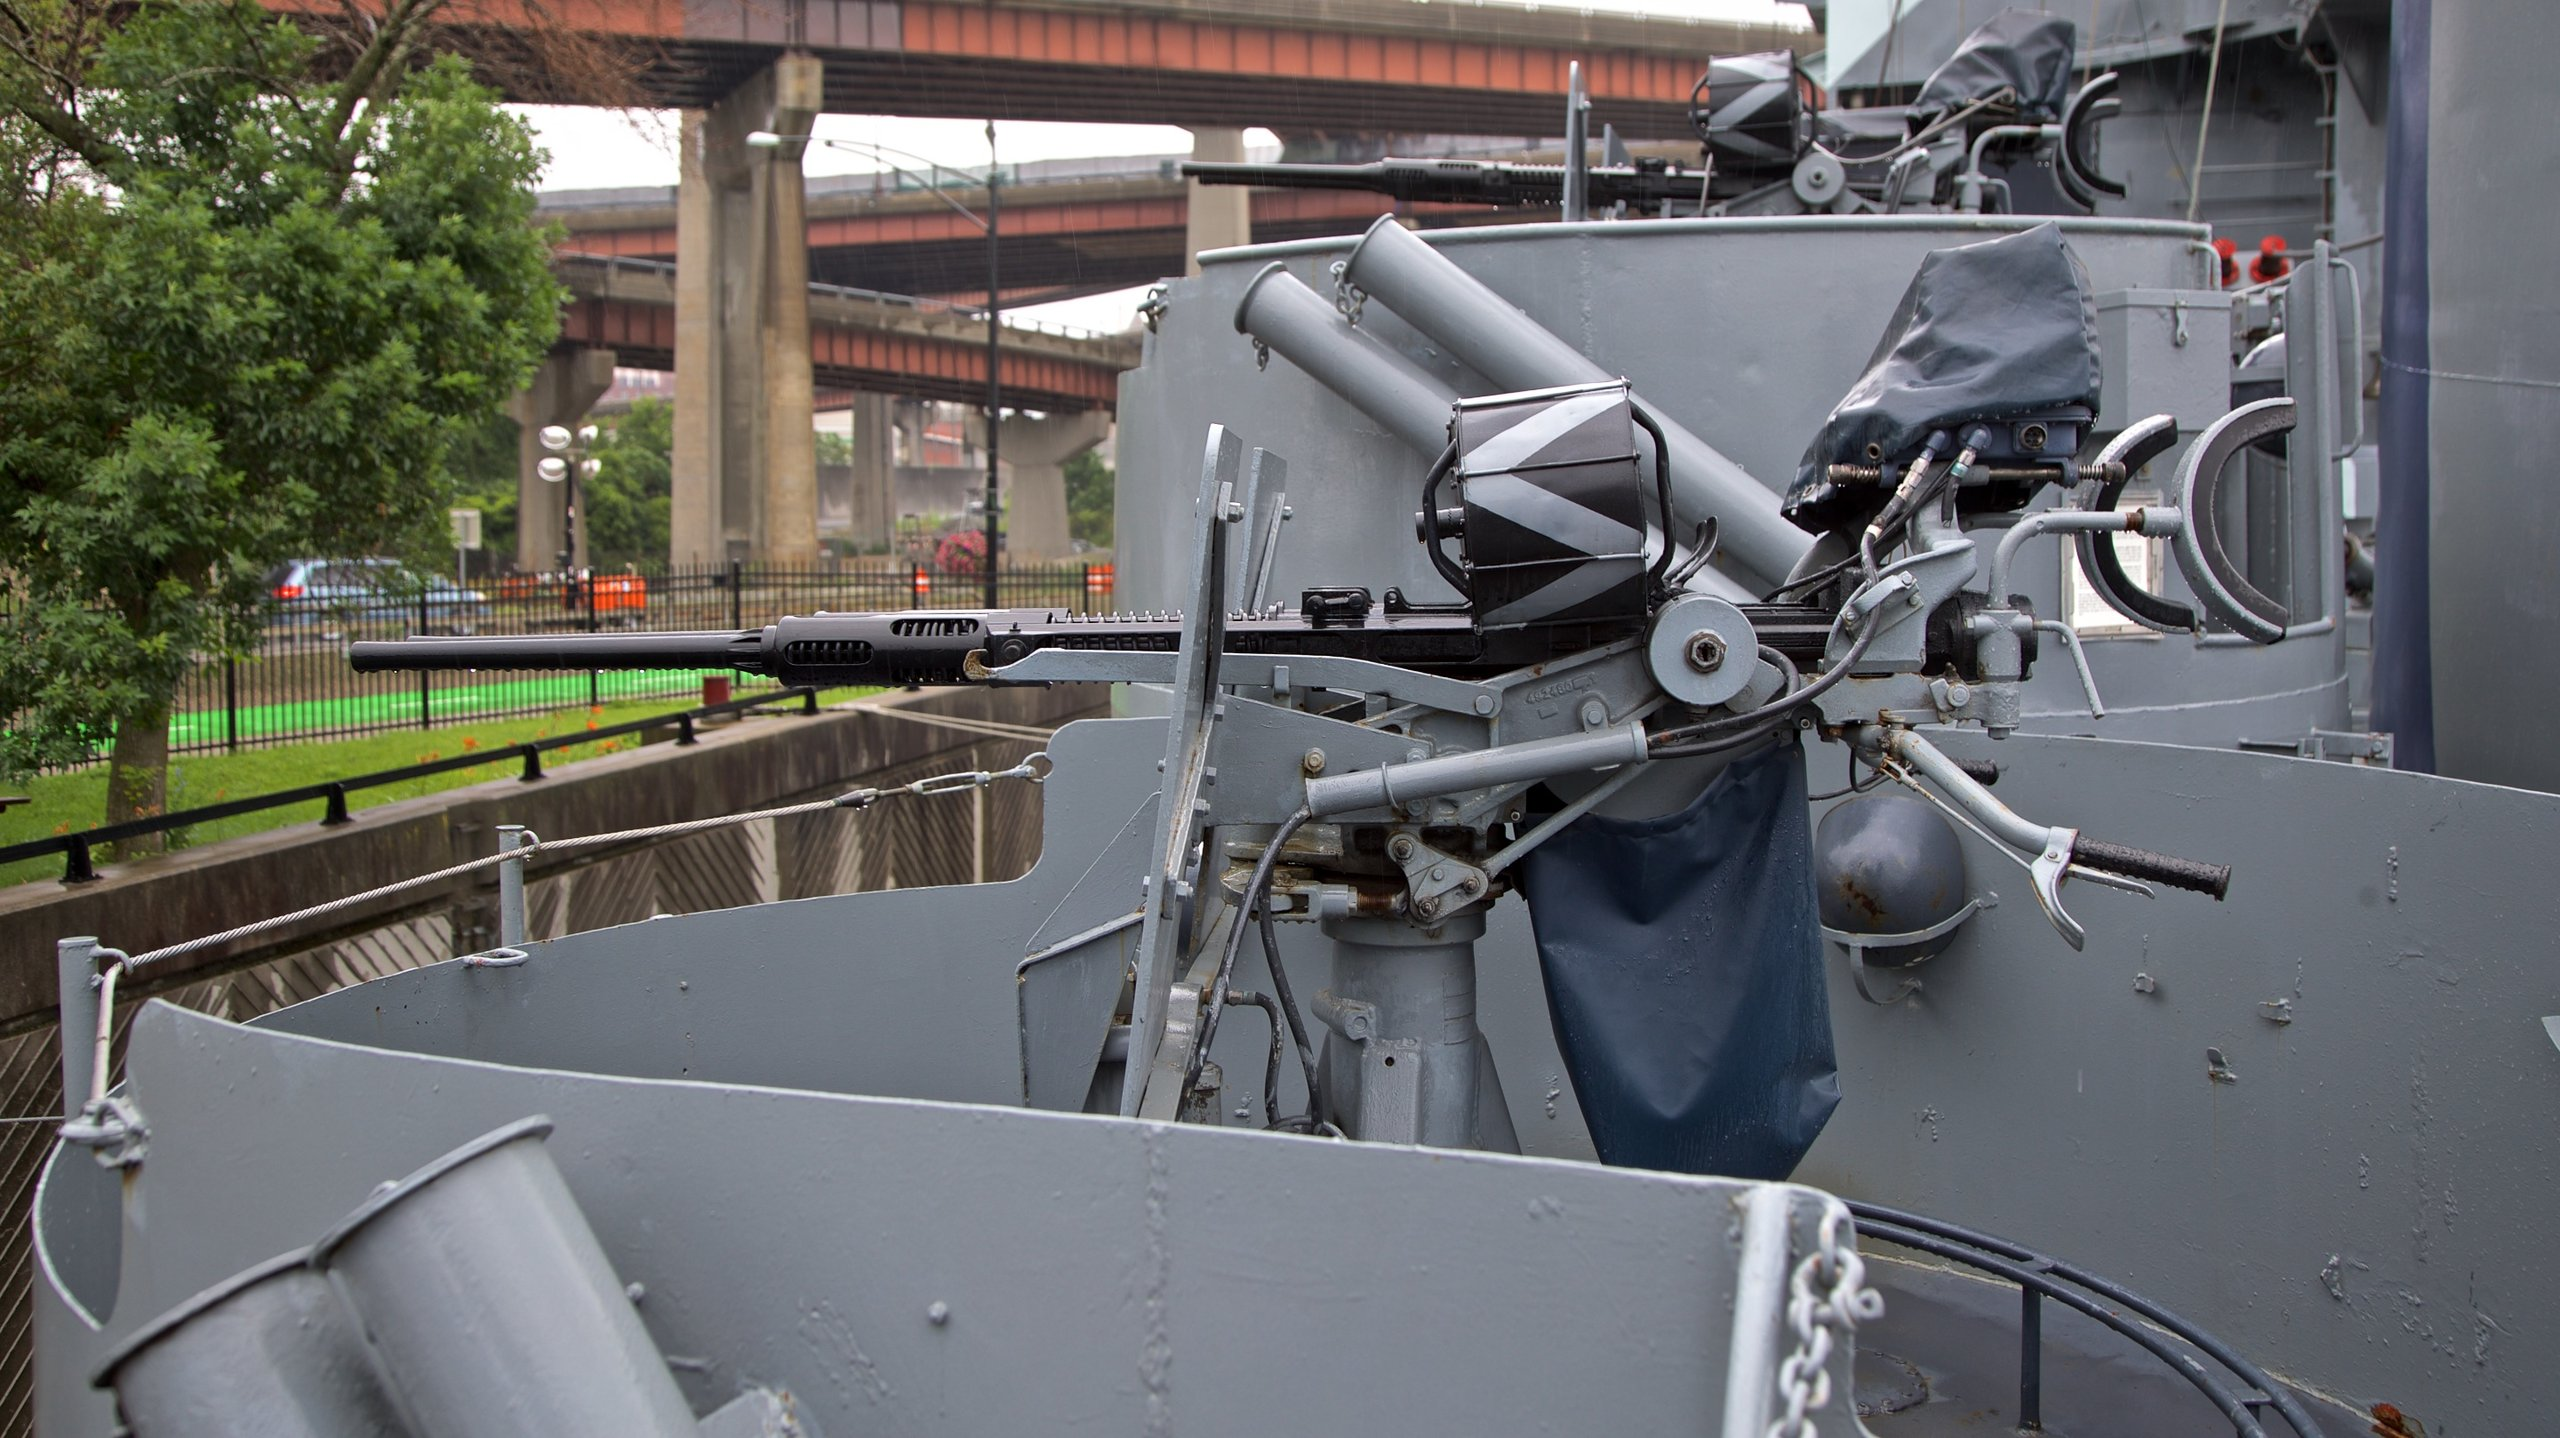 USS Slater, Albany, New York, United States of America